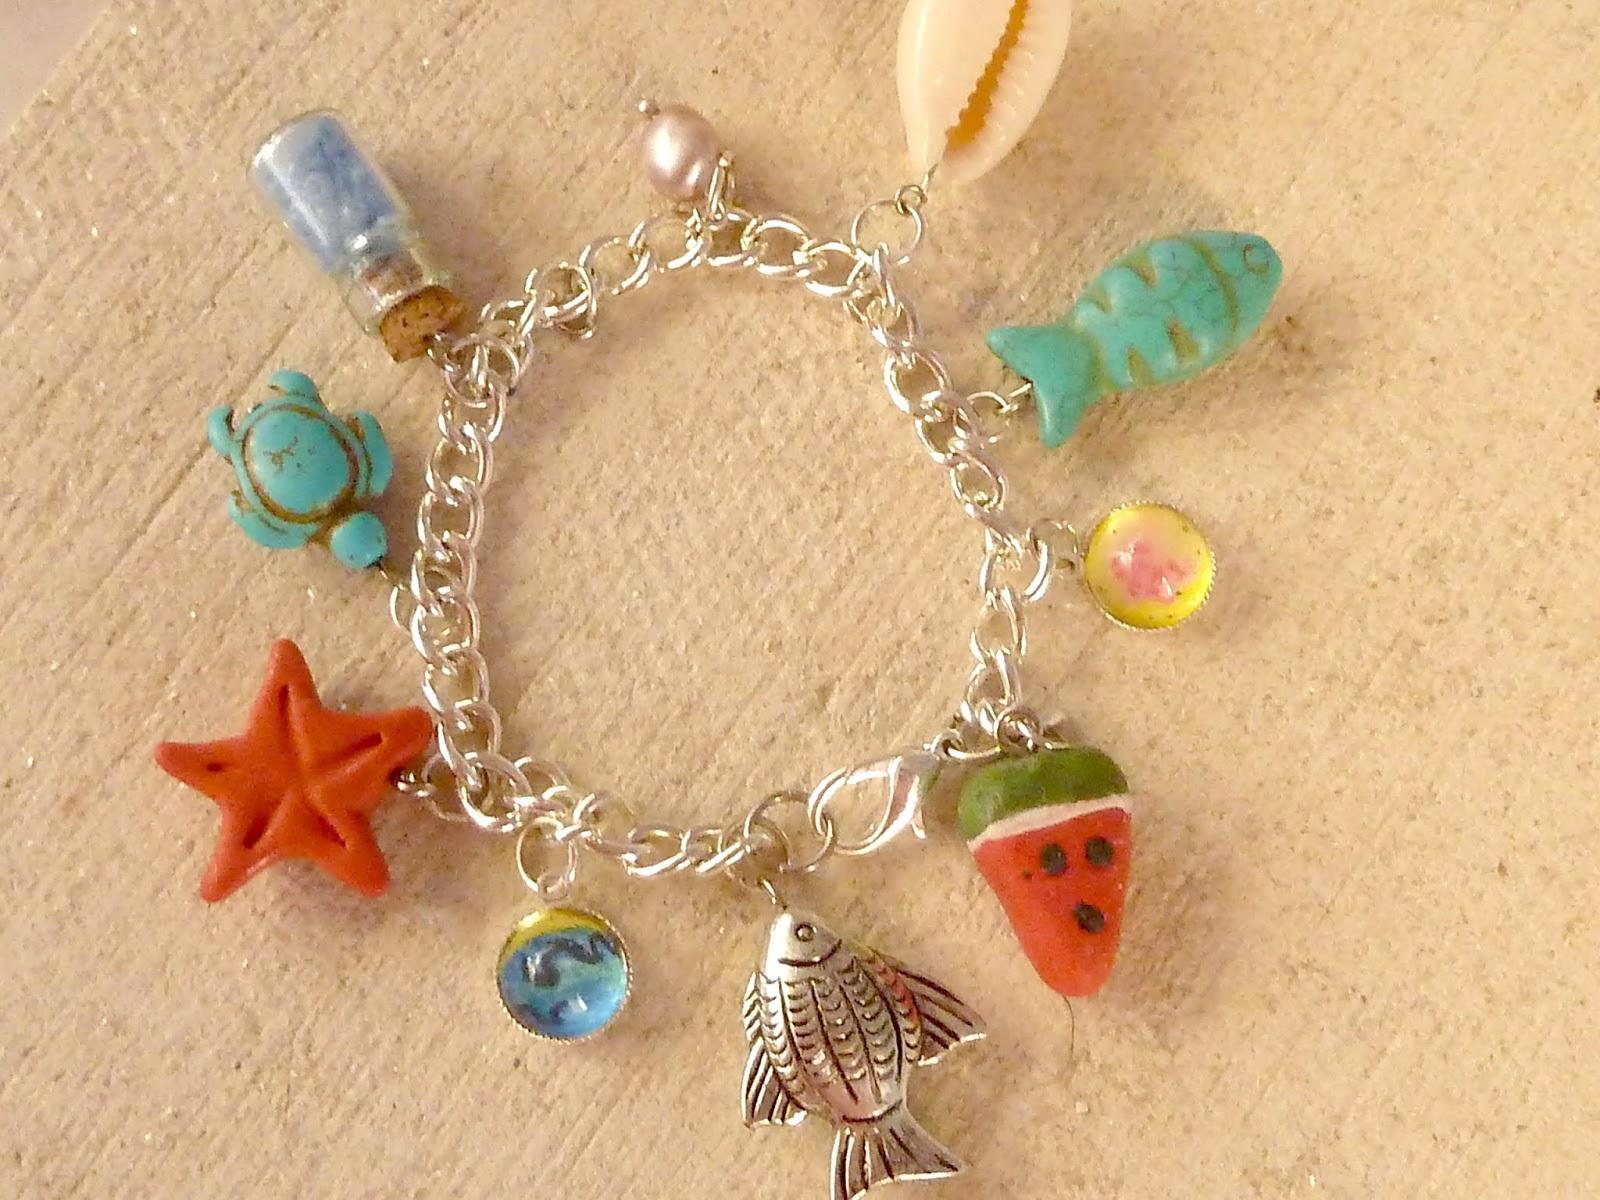 24 pcs Multi-Color Rectangular 30mm Large Gemstone Acrylic Plastic Craft Beads